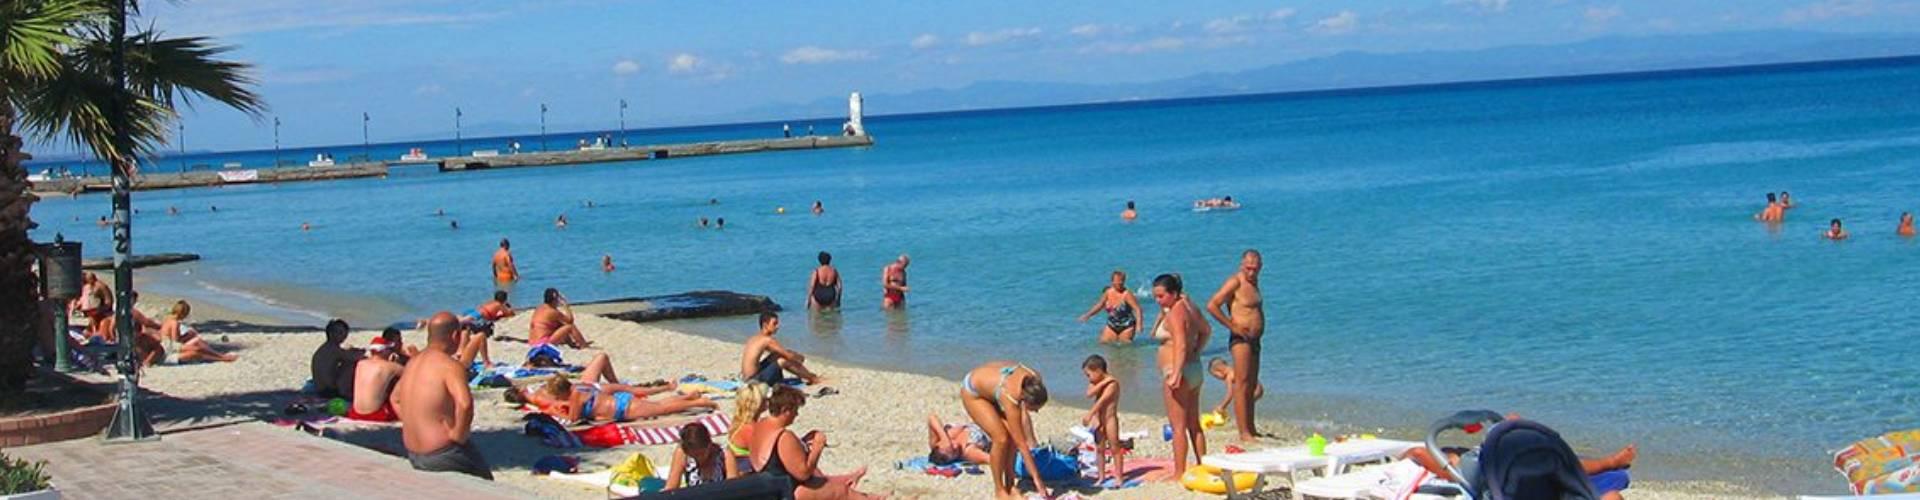 Pefkohori najlepše plaže